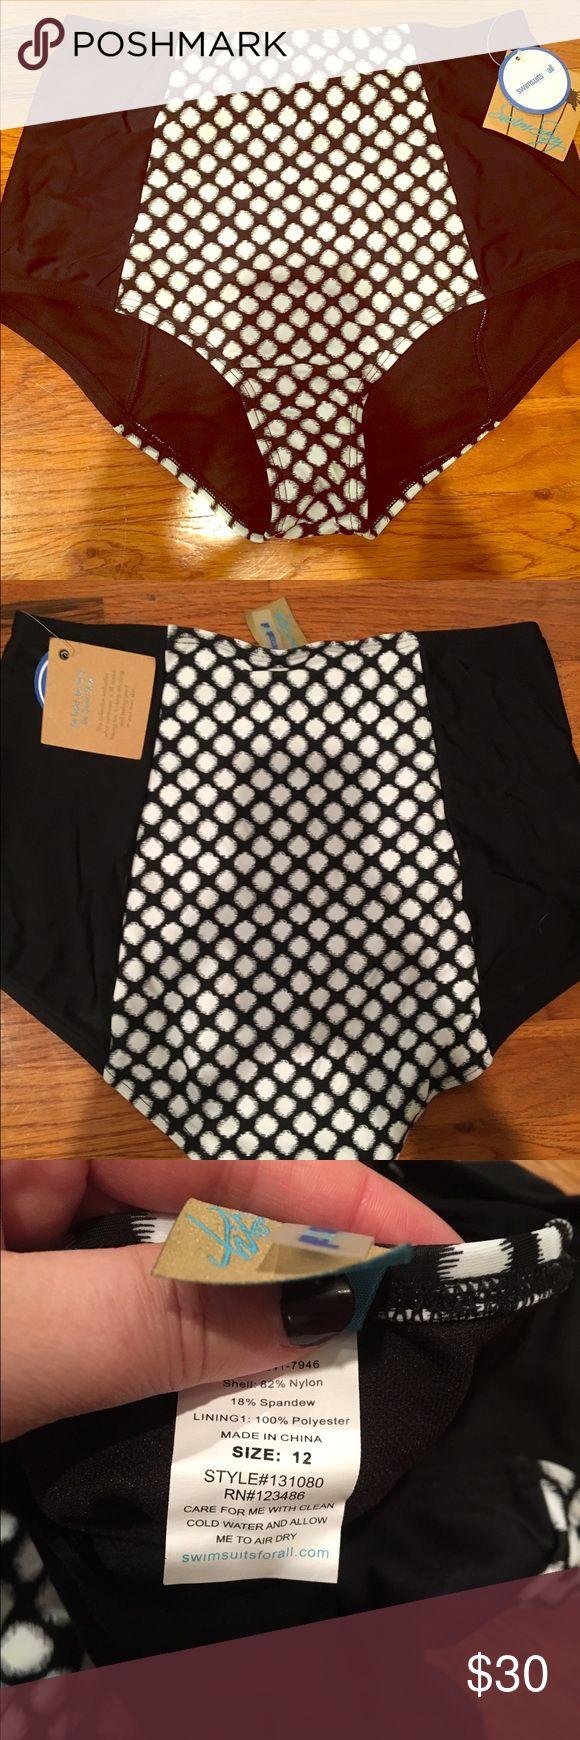 New High waisted black and white bikini bottom High waisted black and white bikini bottoms- new with tag. Never worn. Size 12 swimsuitsforall Swim Bikinis